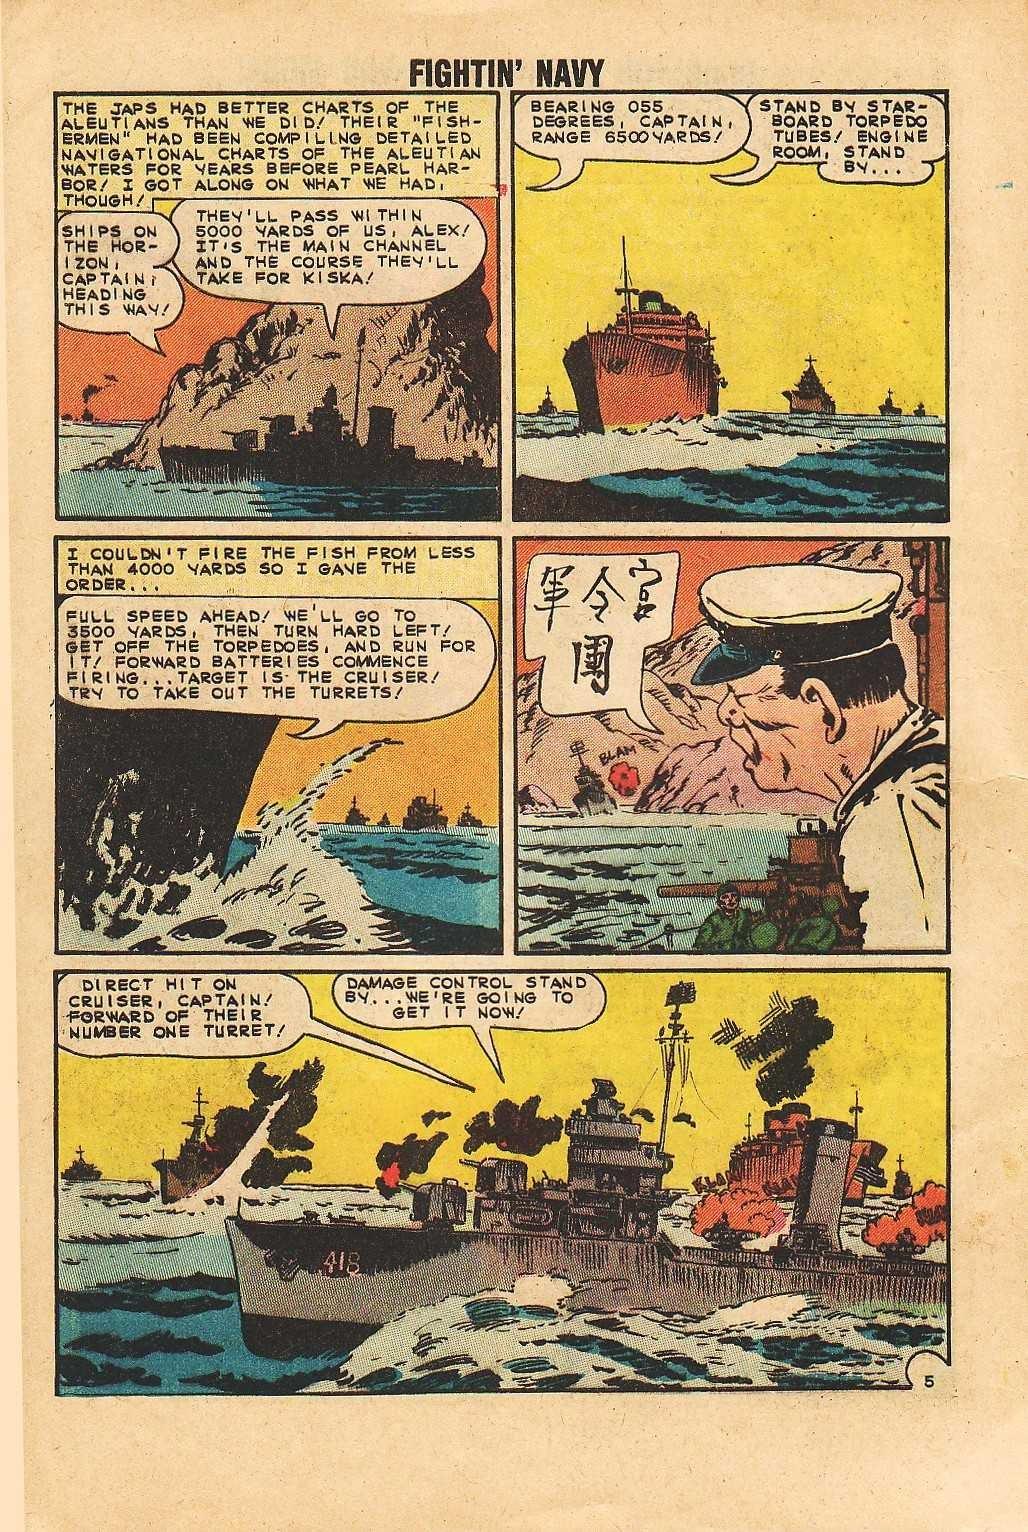 Read online Fightin' Navy comic -  Issue #113 - 8